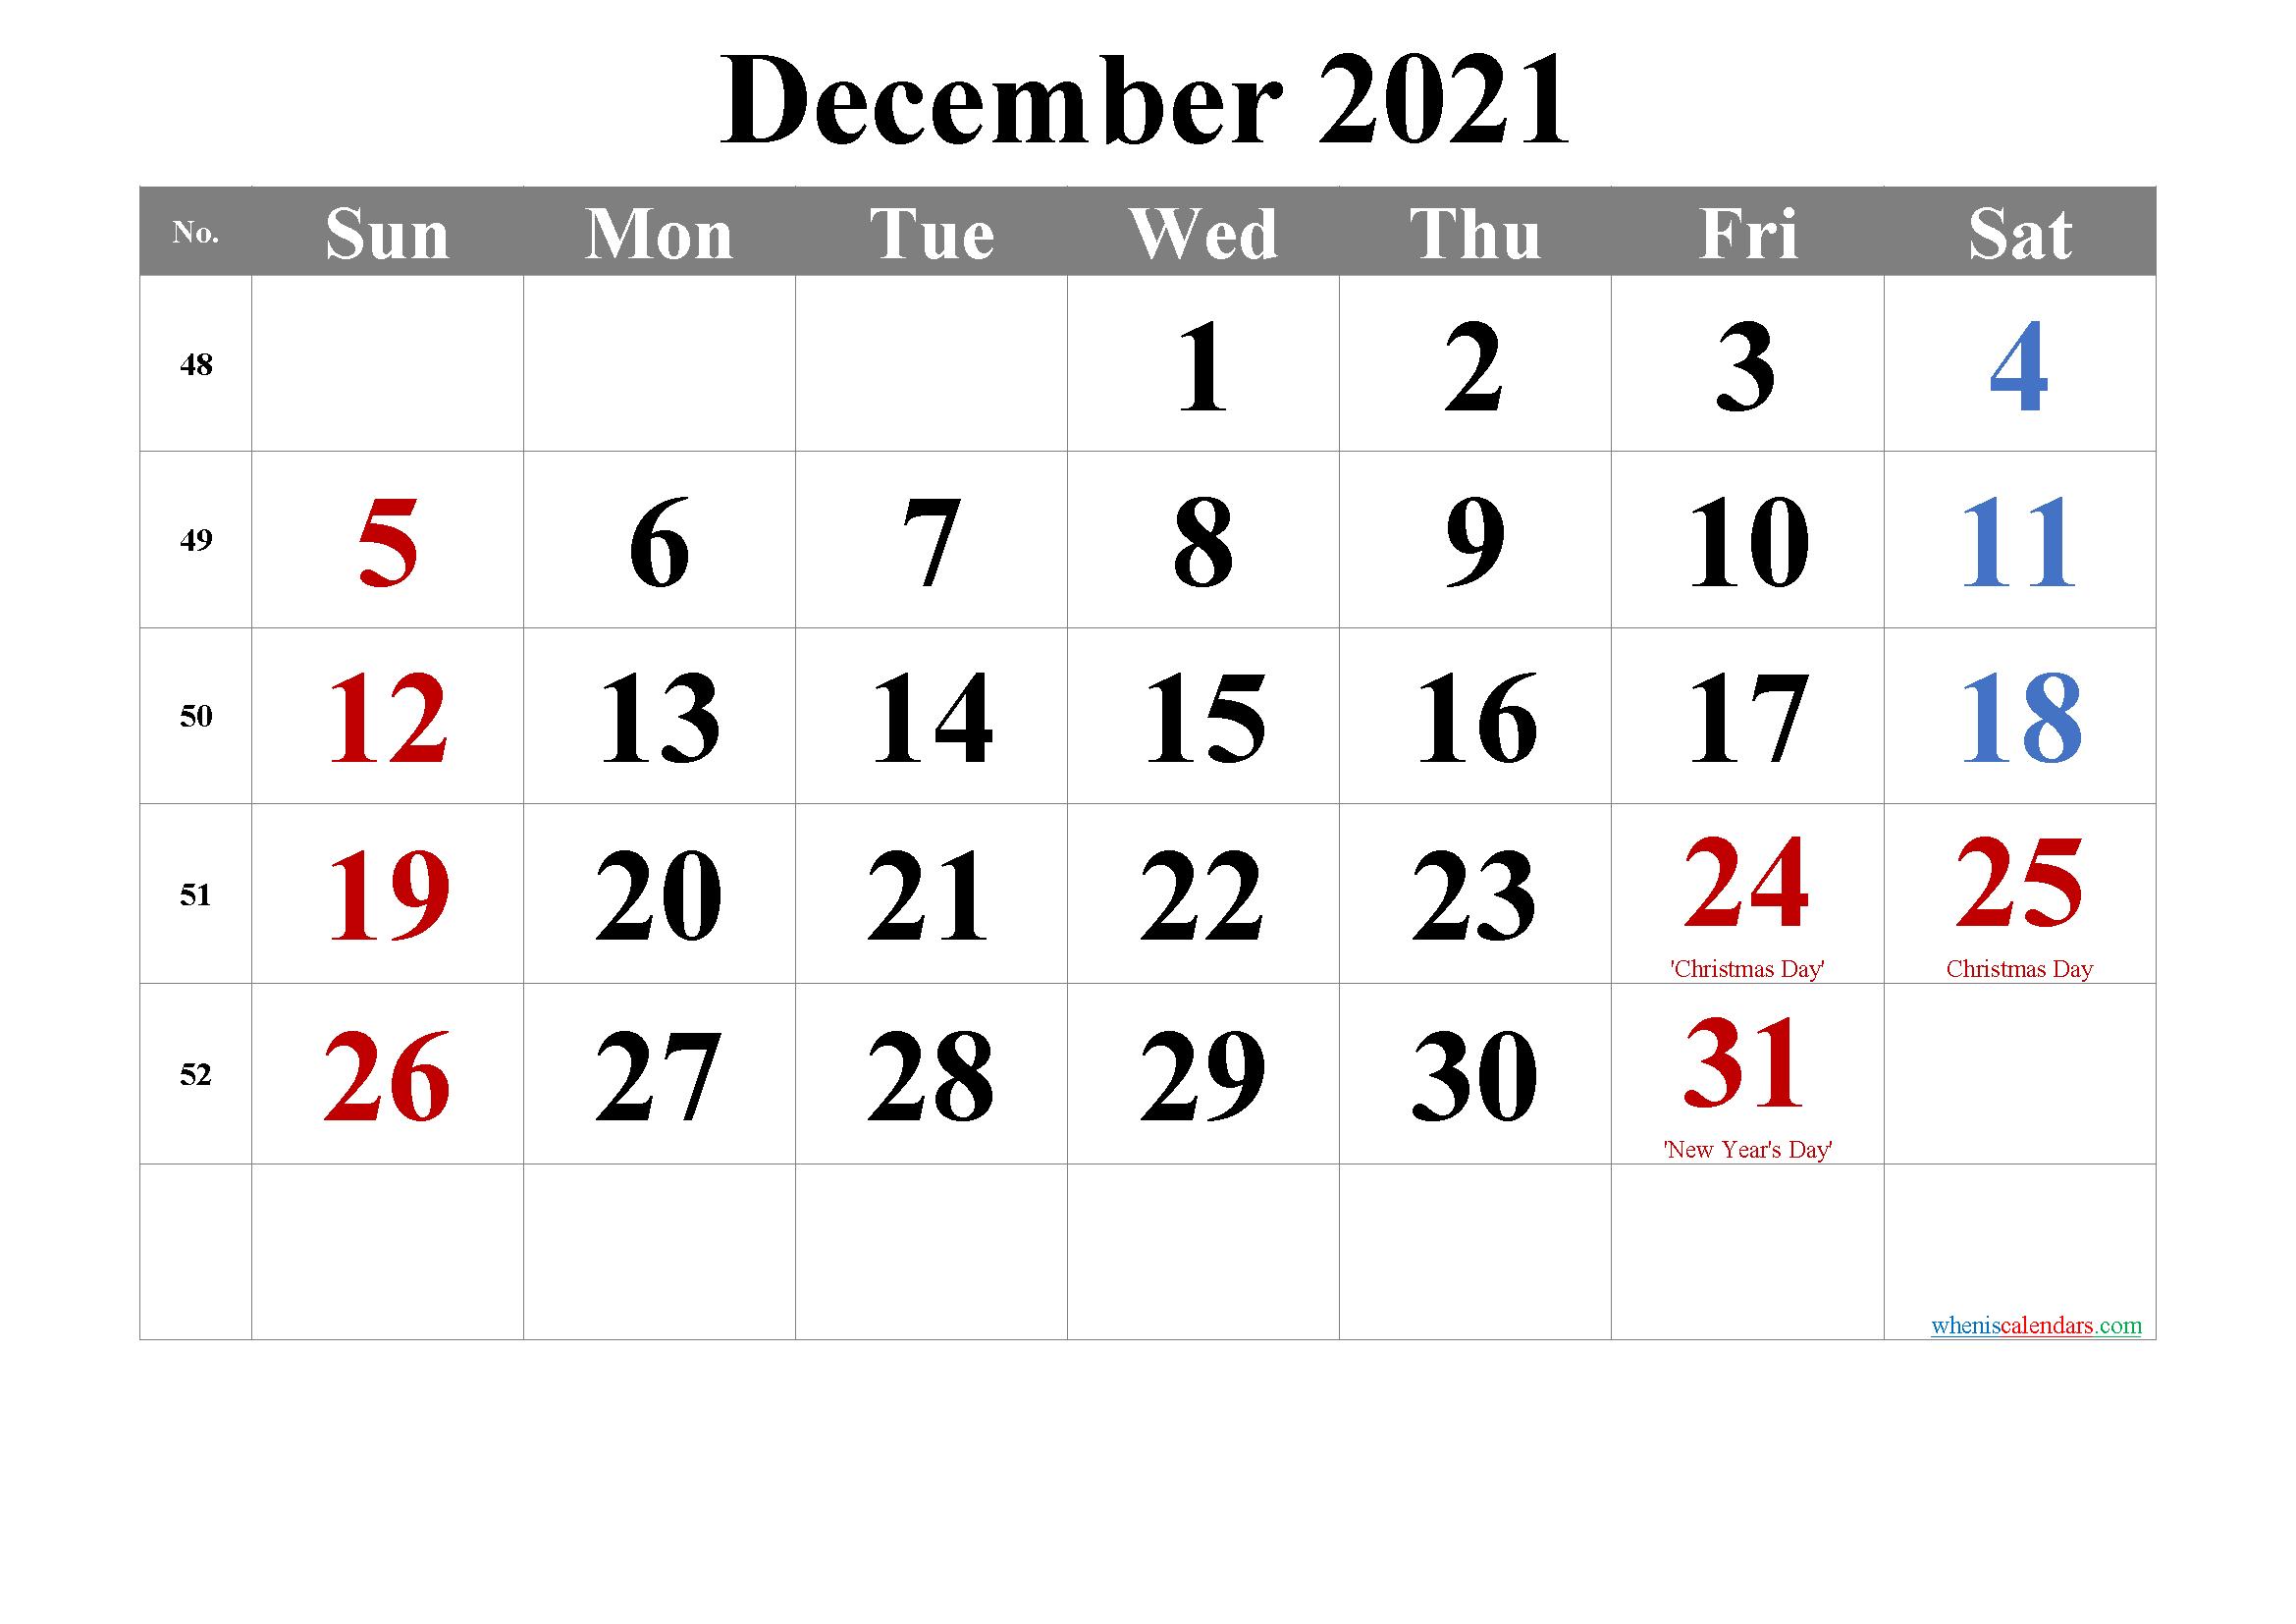 December 2021 Calendar with Holidays Printable-Template No